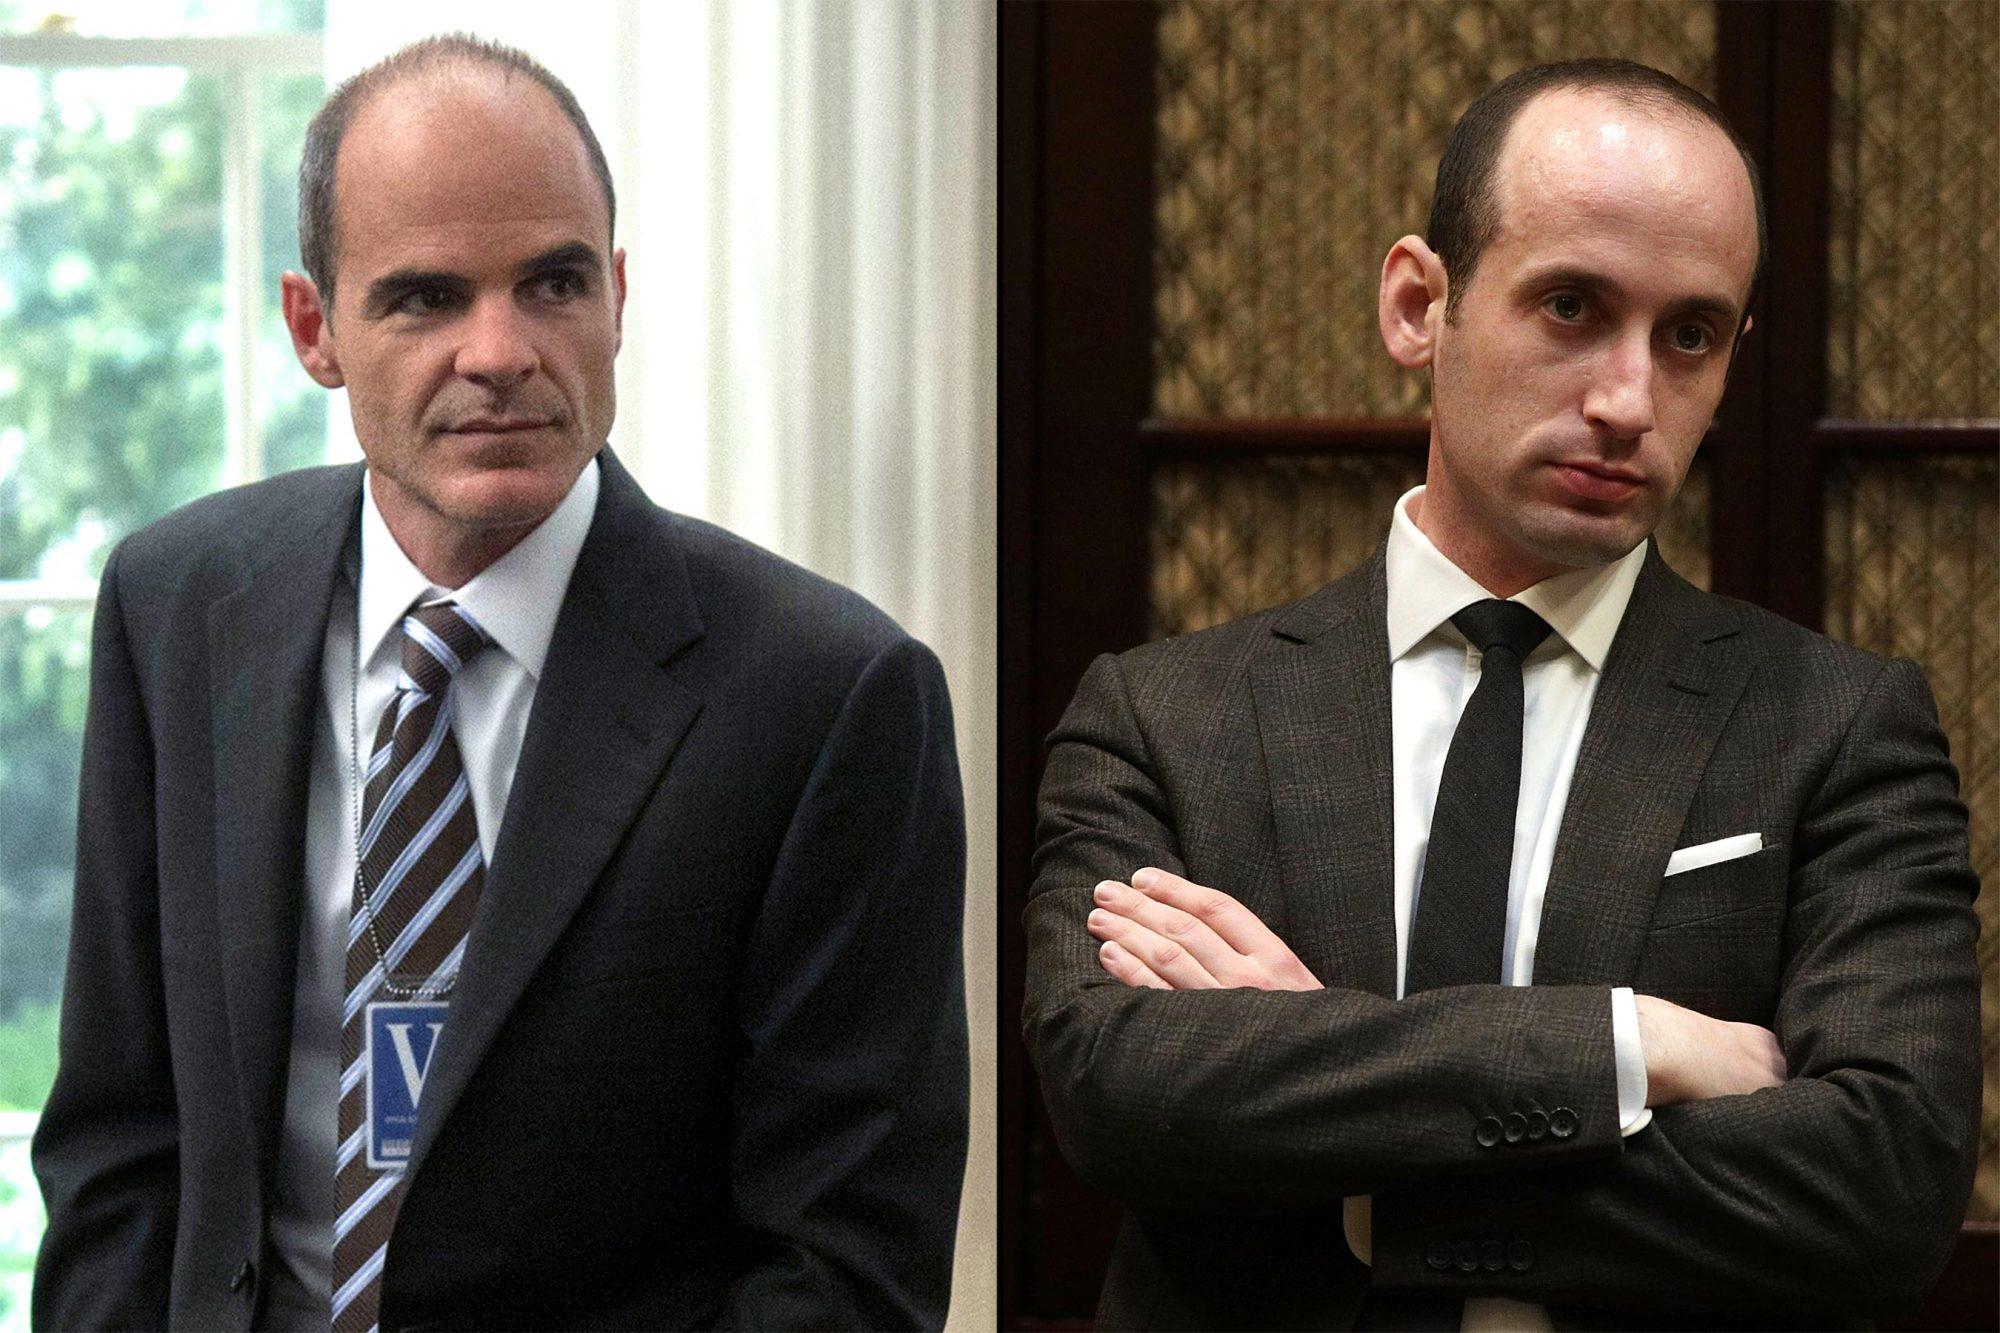 Michael-Kelly-Stephen-Miller